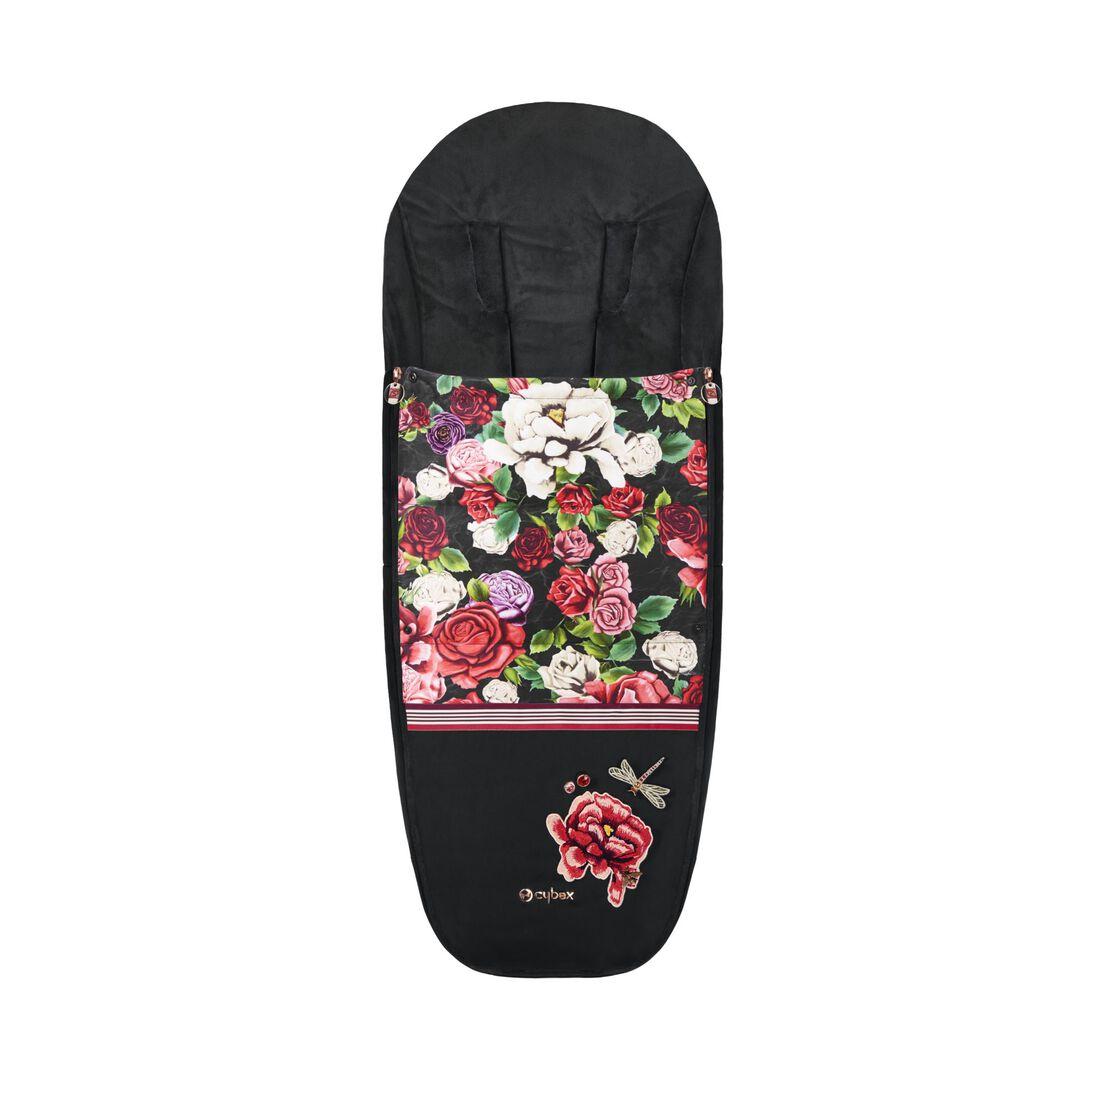 CYBEX Platinum Fußsack - Spring Blossom Dark in Spring Blossom Dark large Bild 1